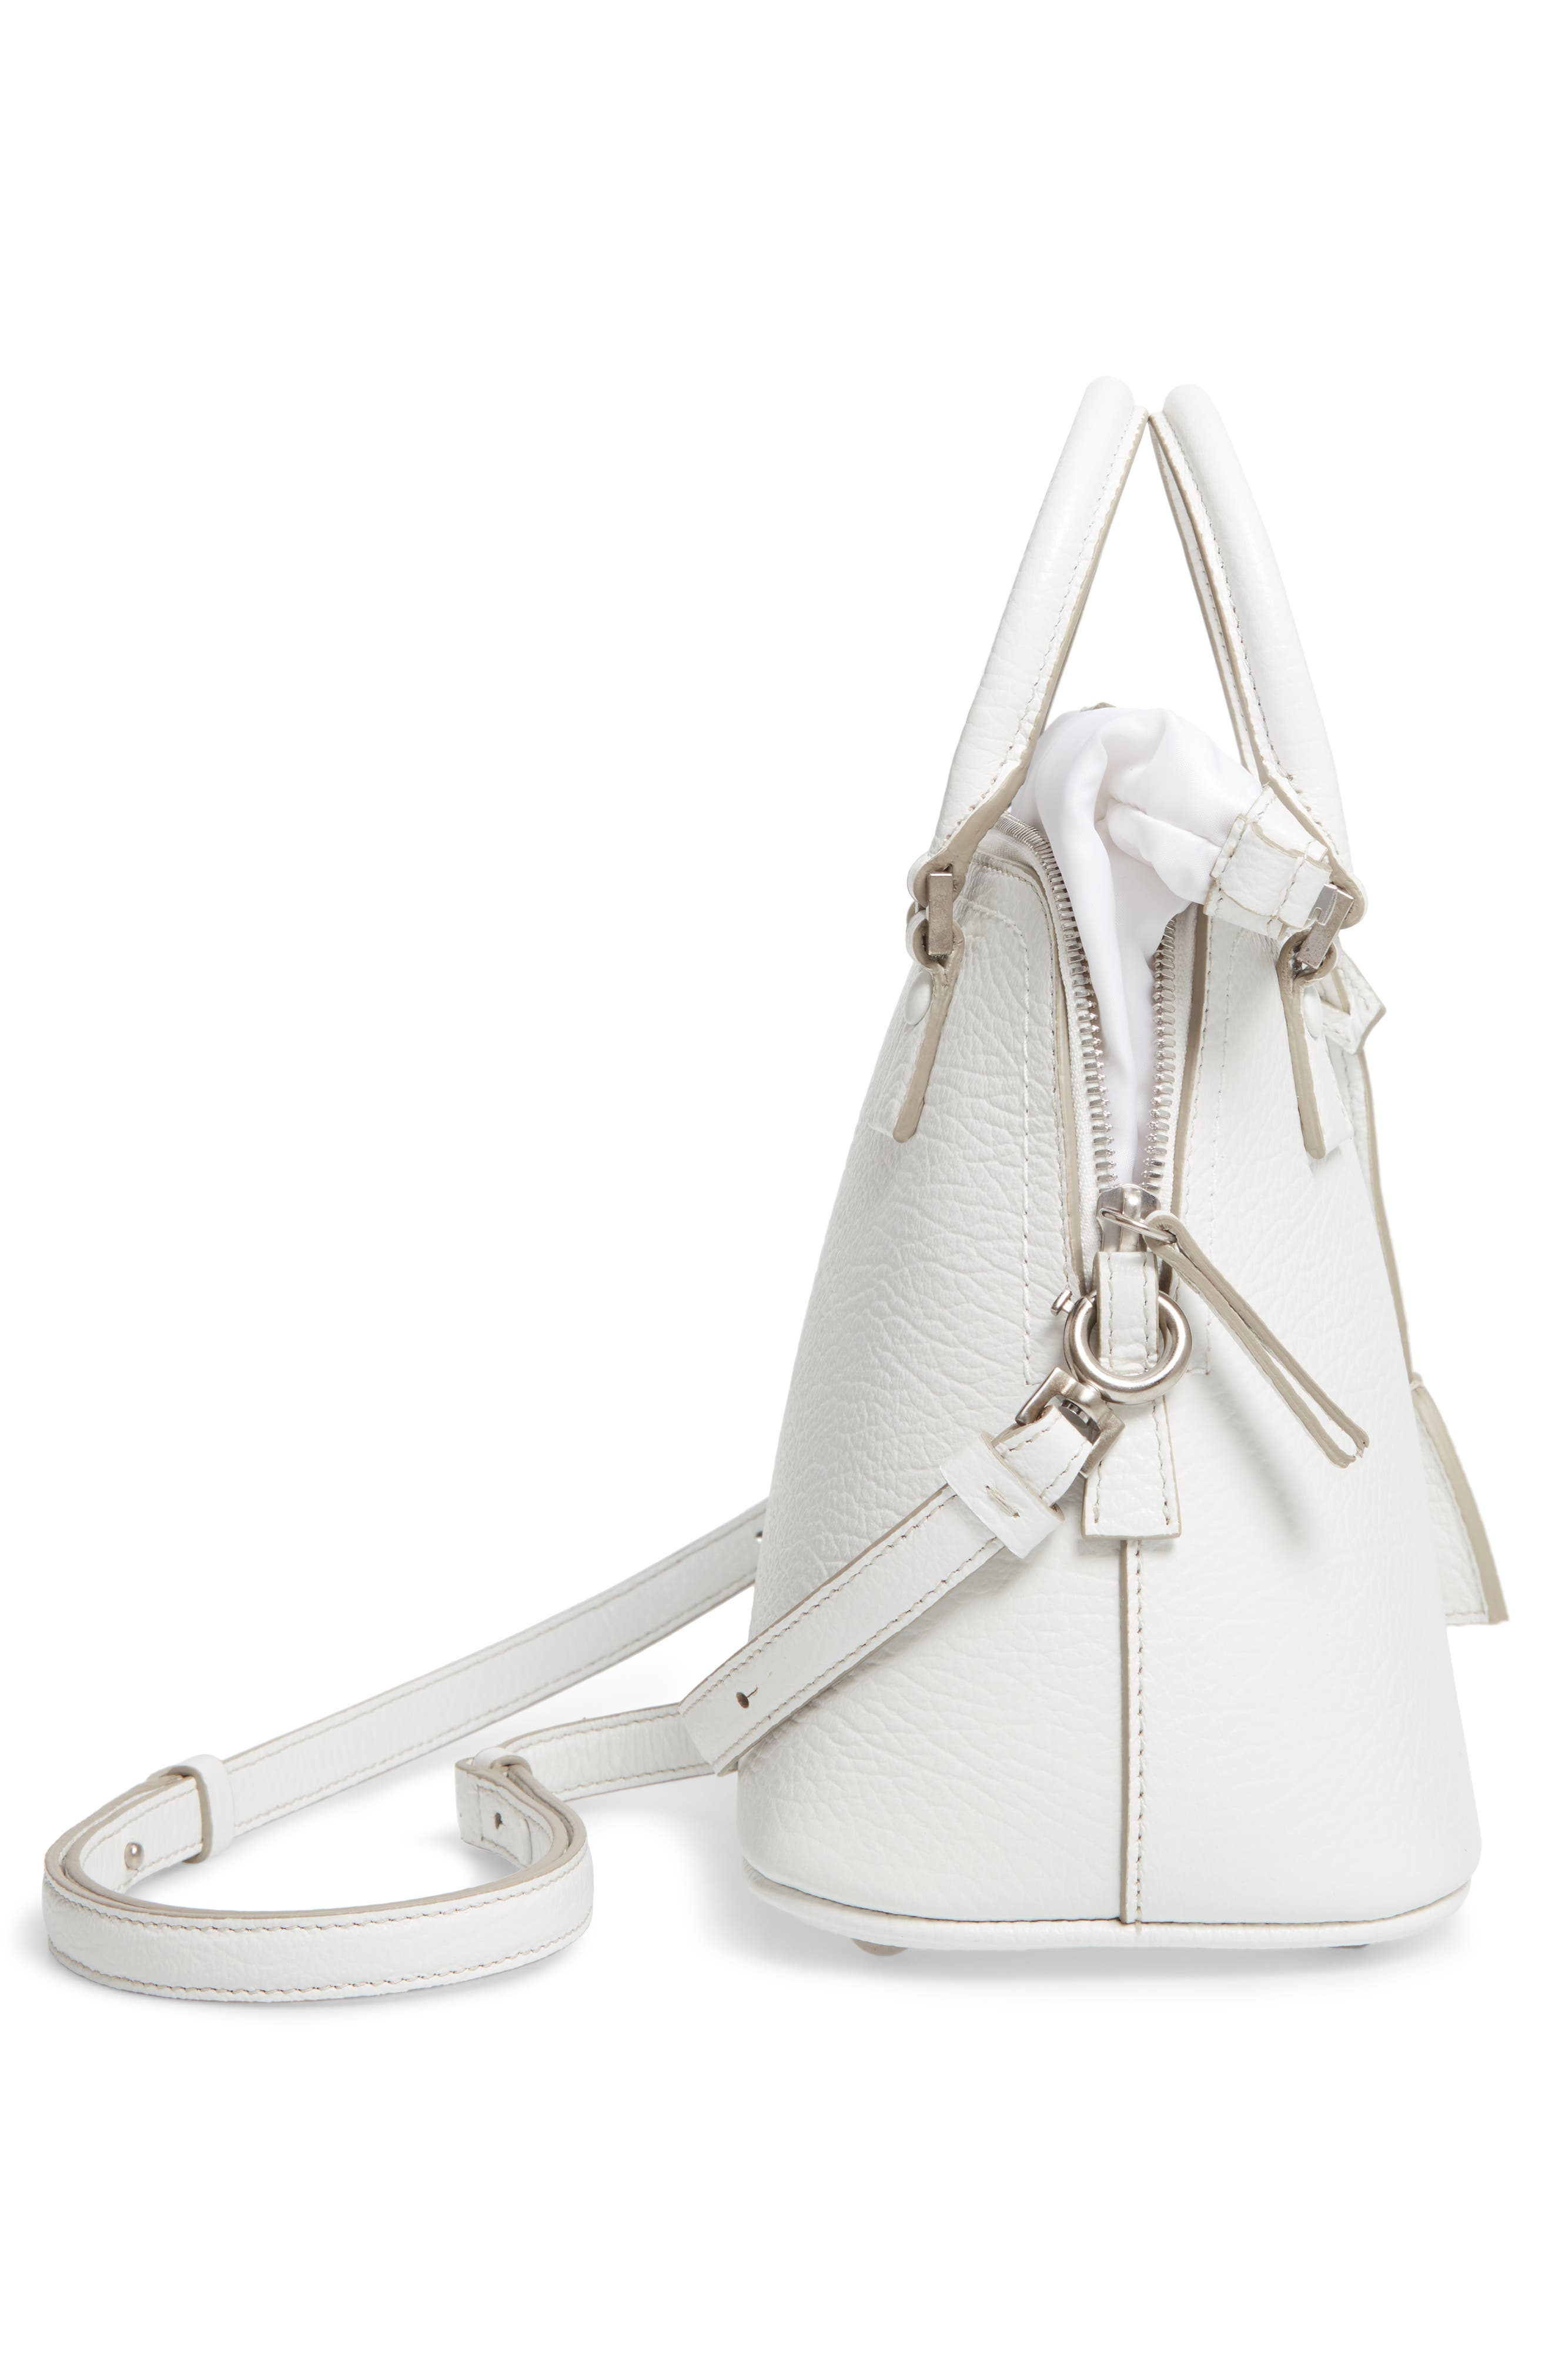 Small 5AC Calfskin Leather Handbag,                             Alternate thumbnail 6, color,                             WHITE